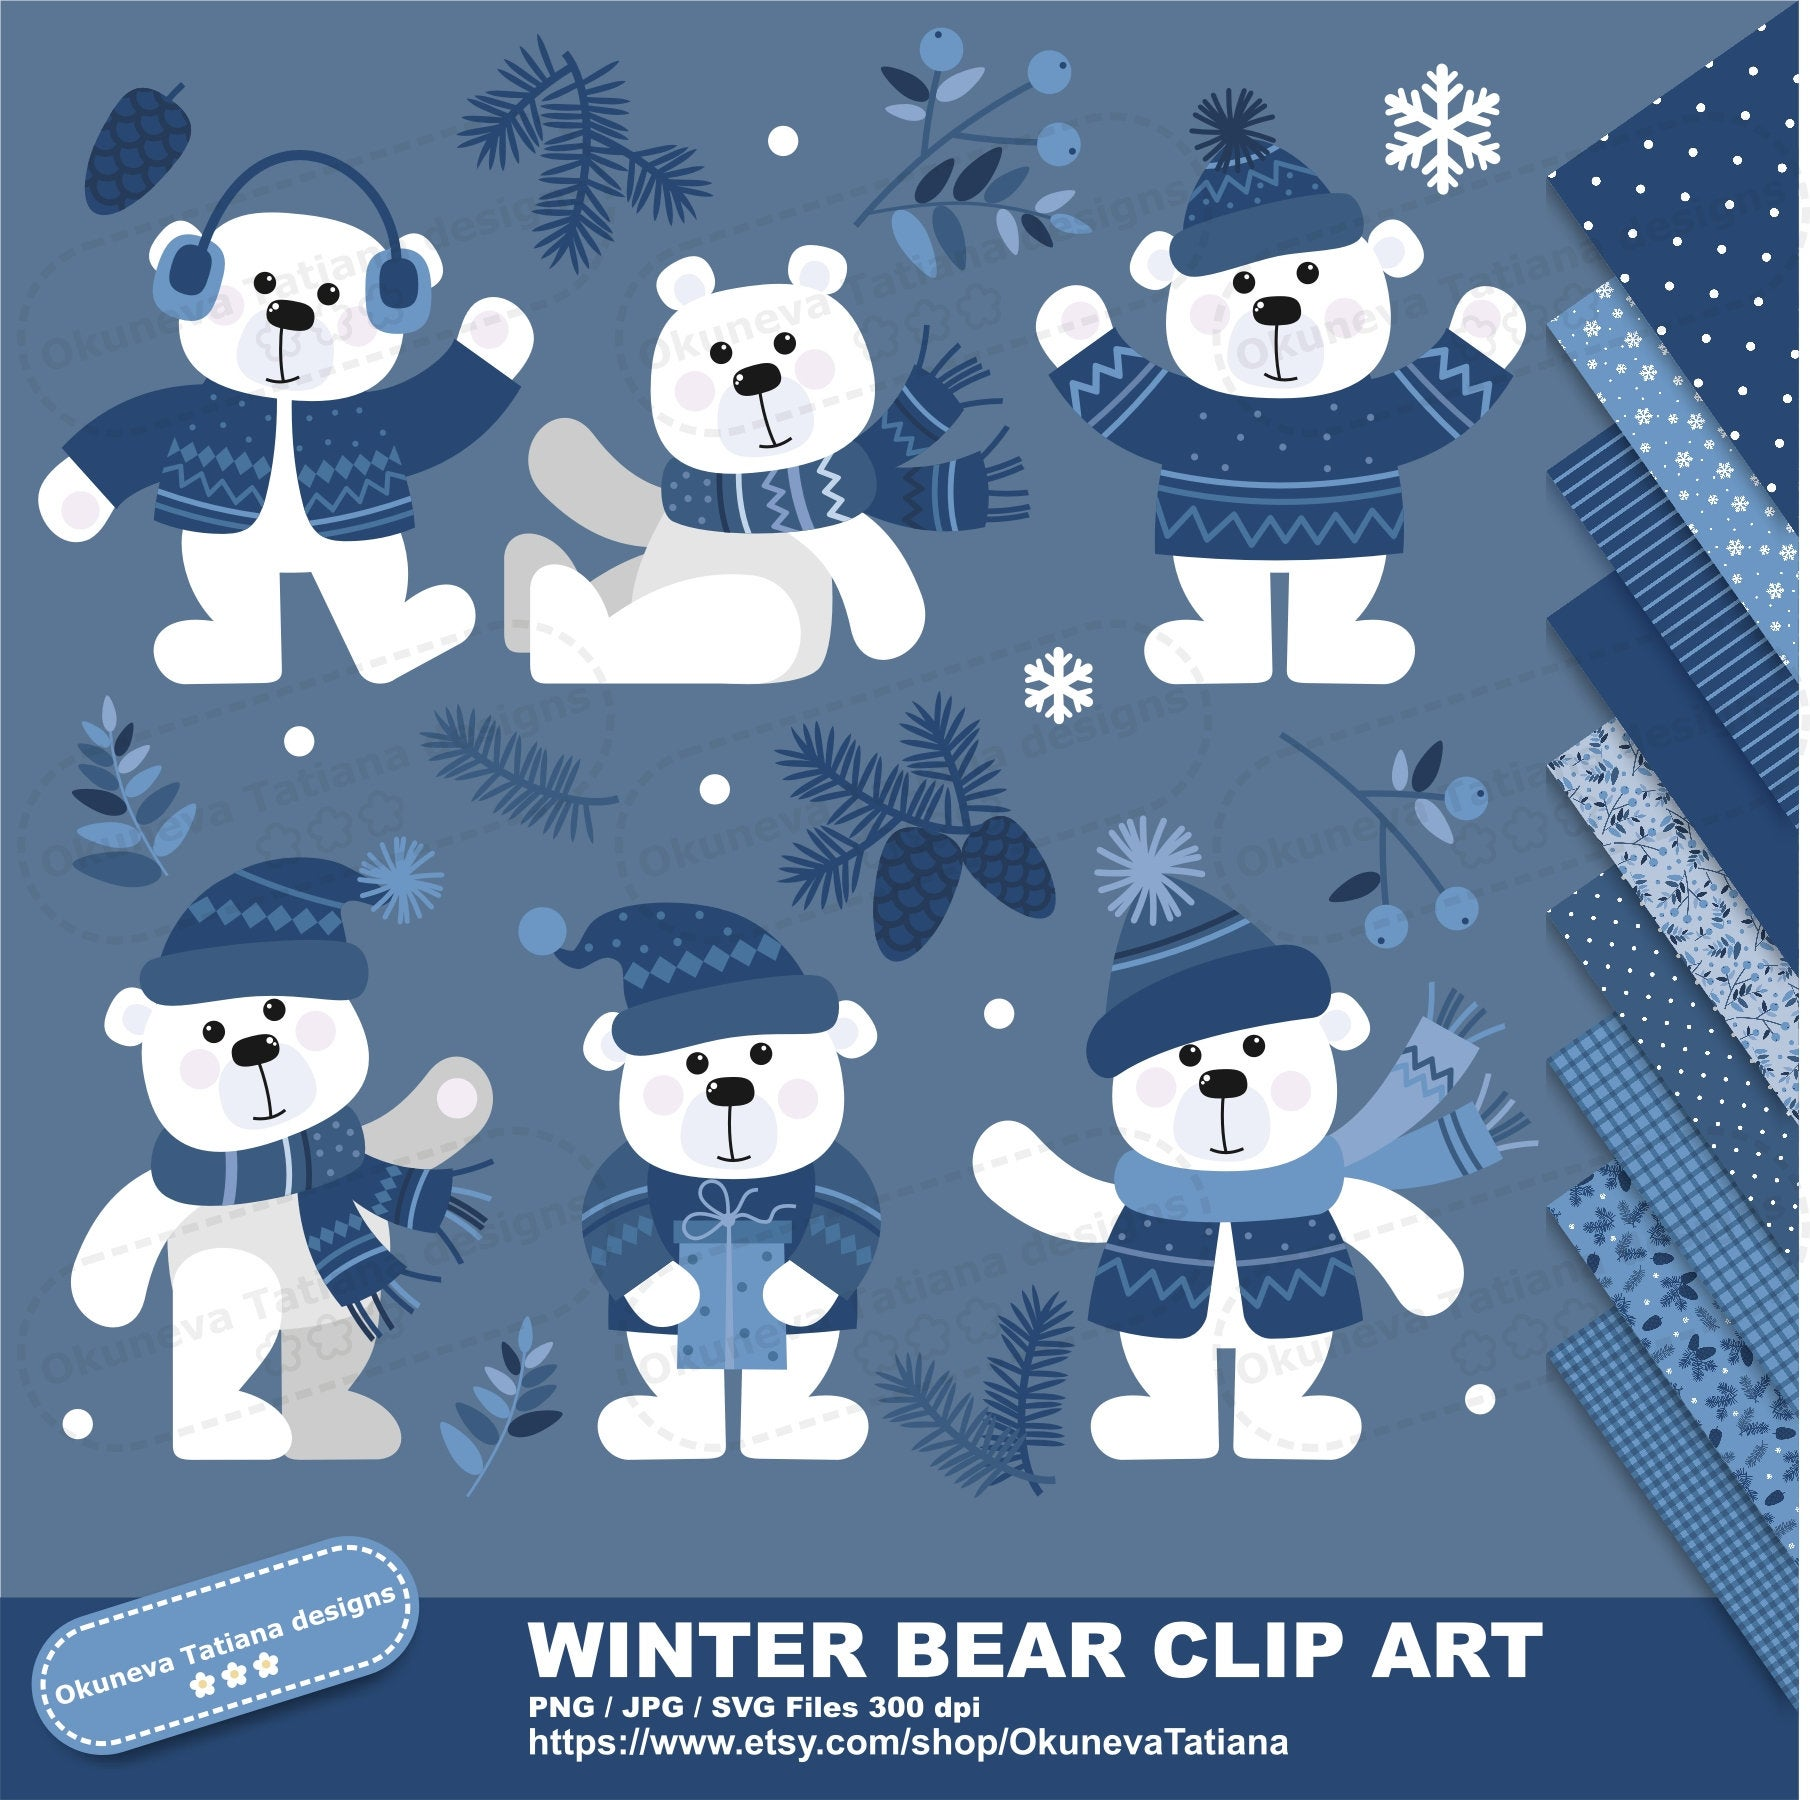 Winter Bear Clip Art Set, PNG Files Transparent Background, Digital Paper  Pack, JPG Seamless Pattern, Instant Download.